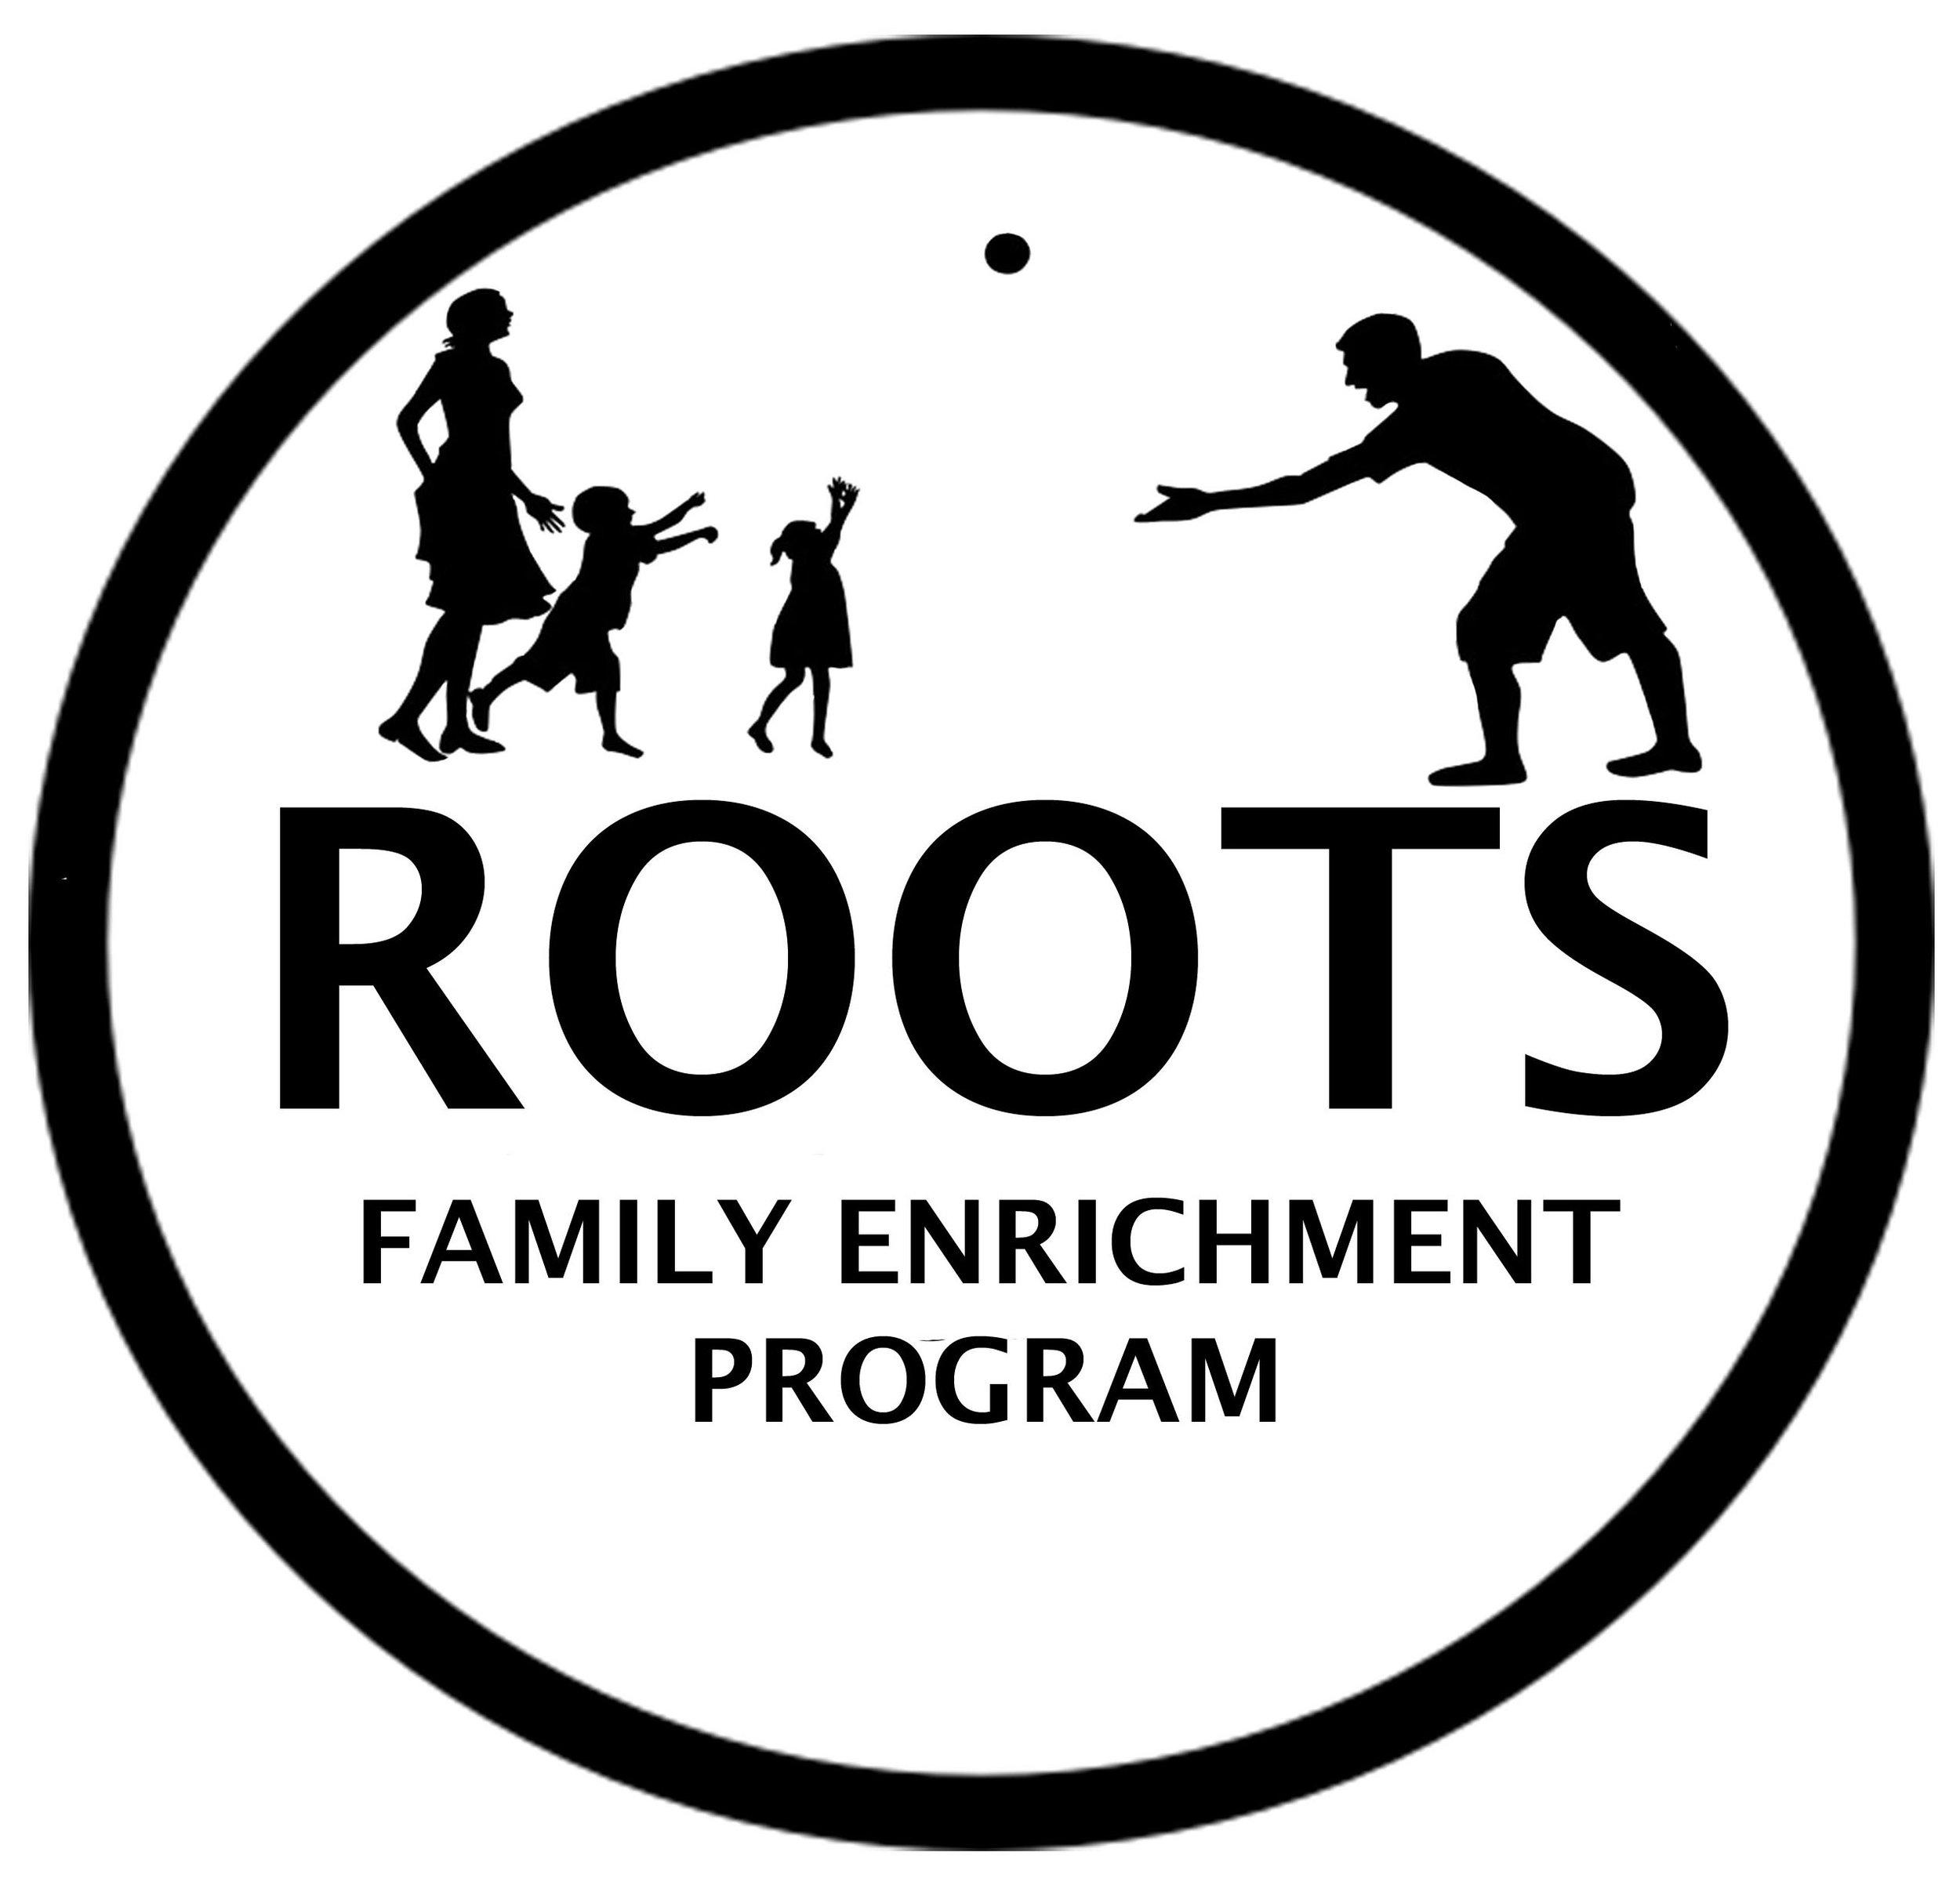 RootsLogo.HD.jpg